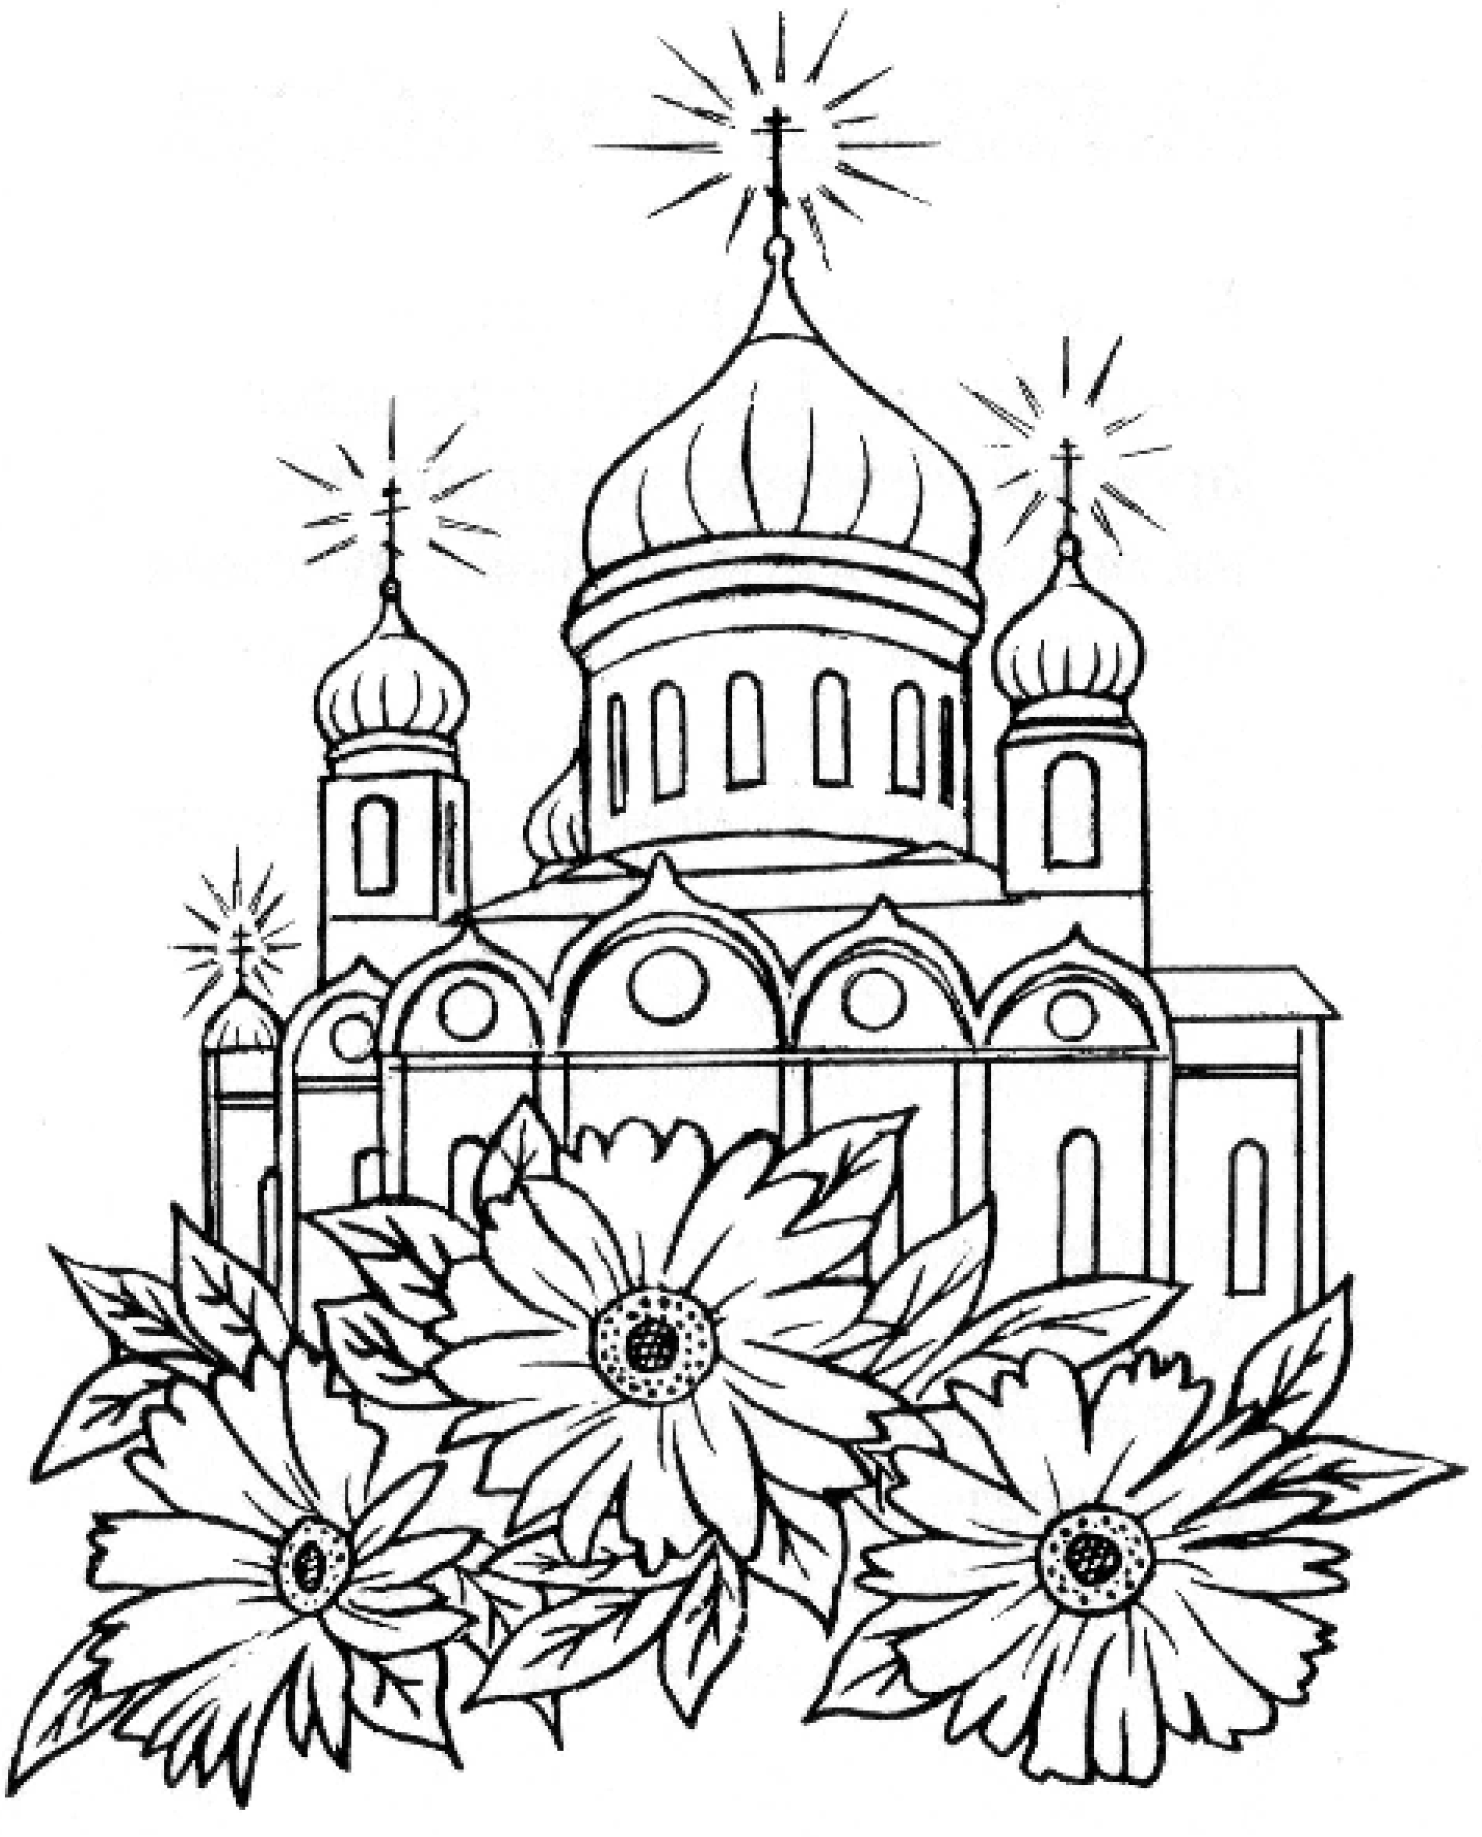 Раскраски.онлайн :: Раскраска православная церковь (с ...